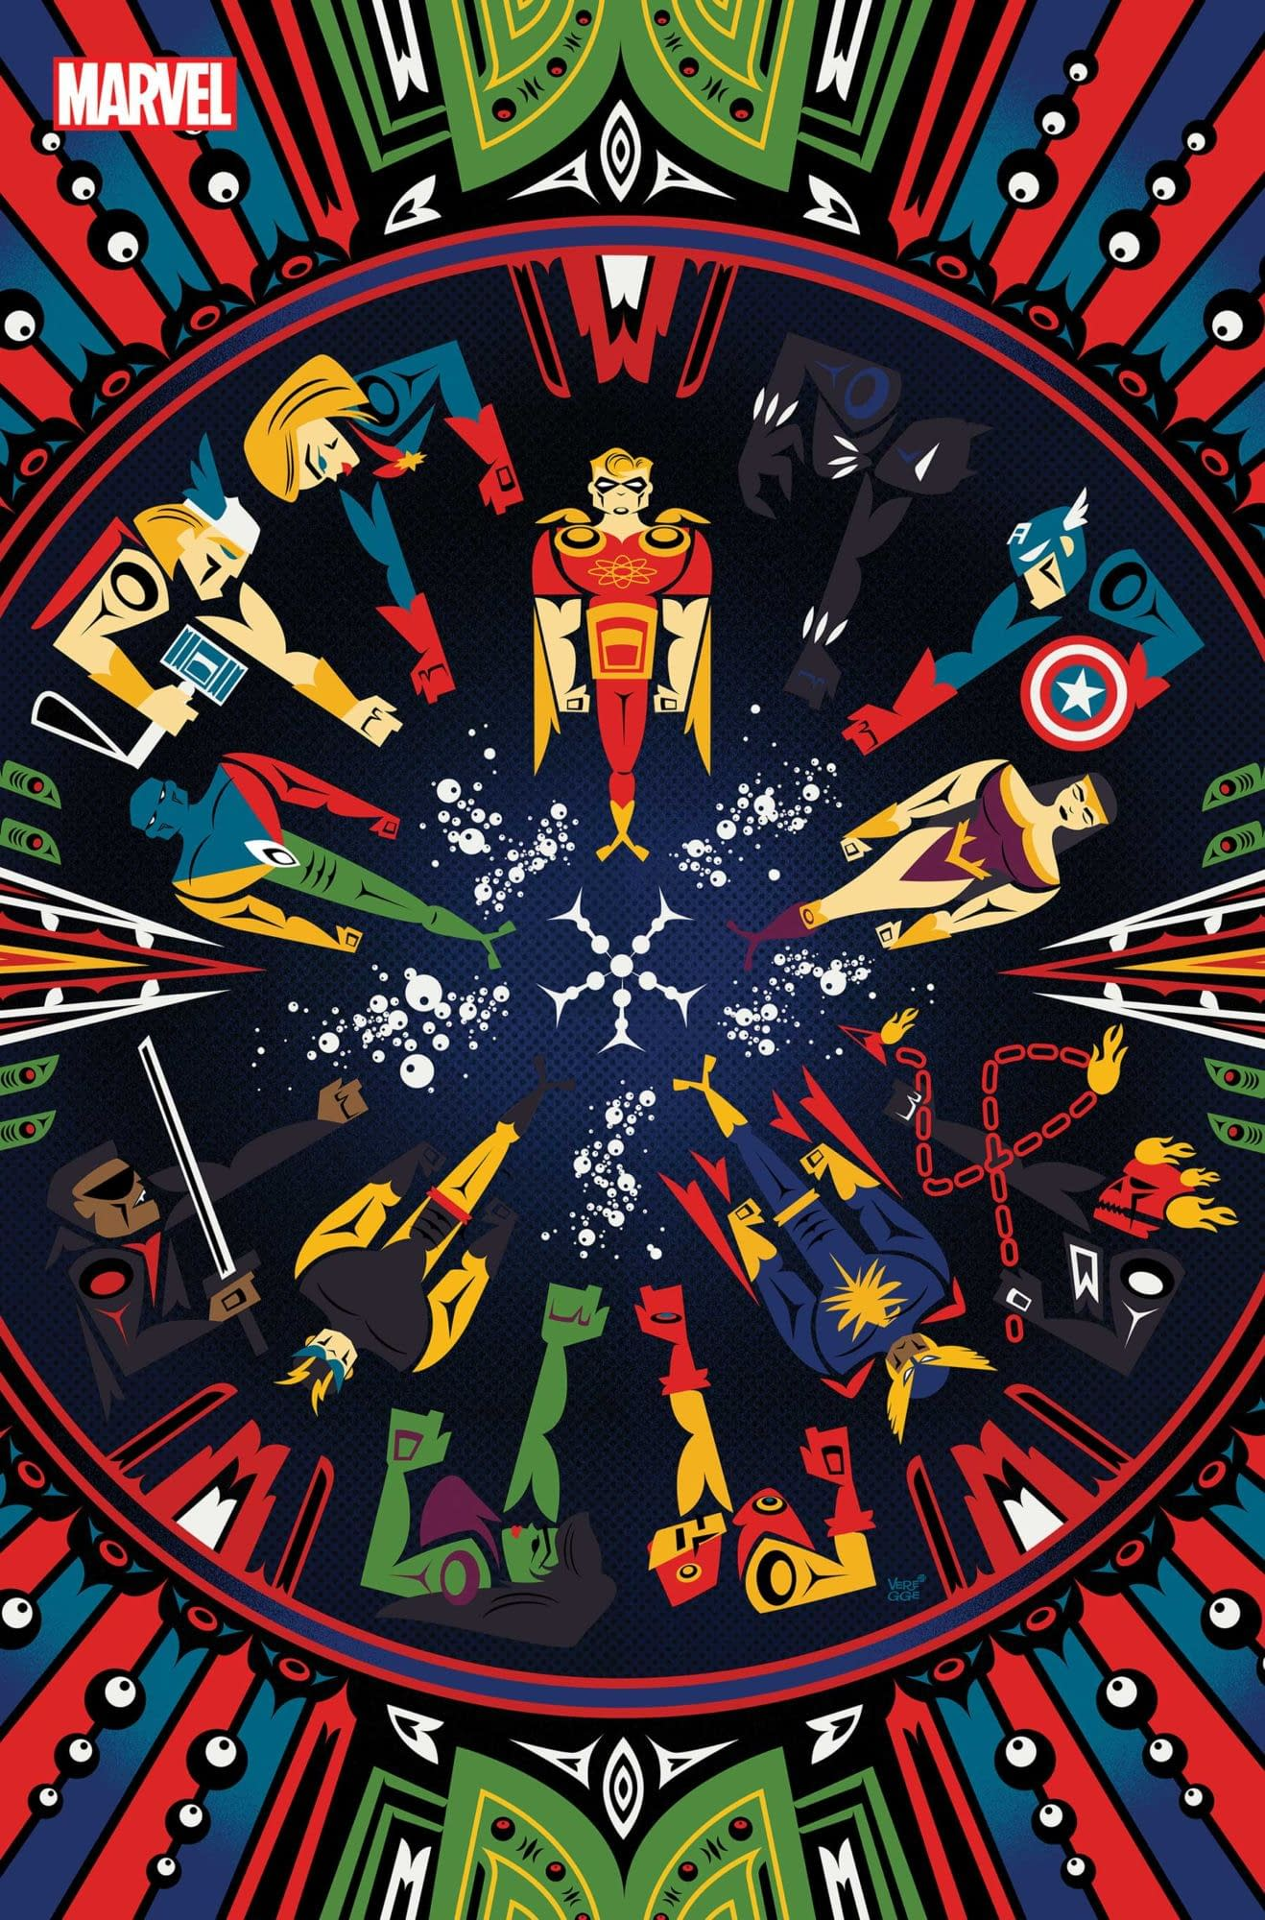 Marvel Comics Full May 2021 Solicits - Heroes Reborn ...